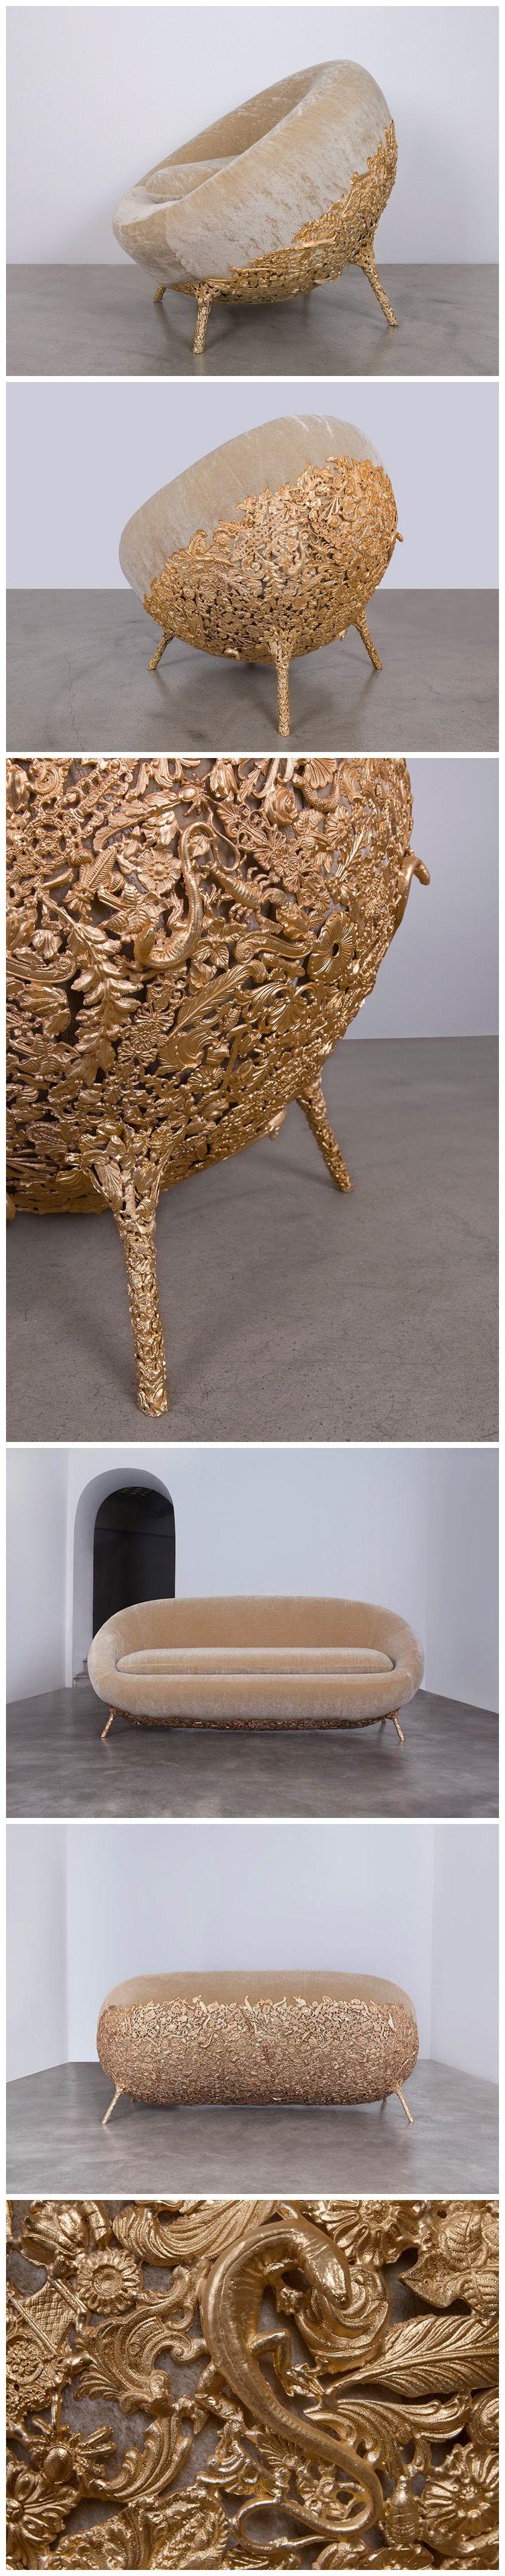 Fernando and Humberto Campana - Brazilian Baroque furniture, interior design, home decor, furniture, seating, couches, sofas, chairs, beige, gold